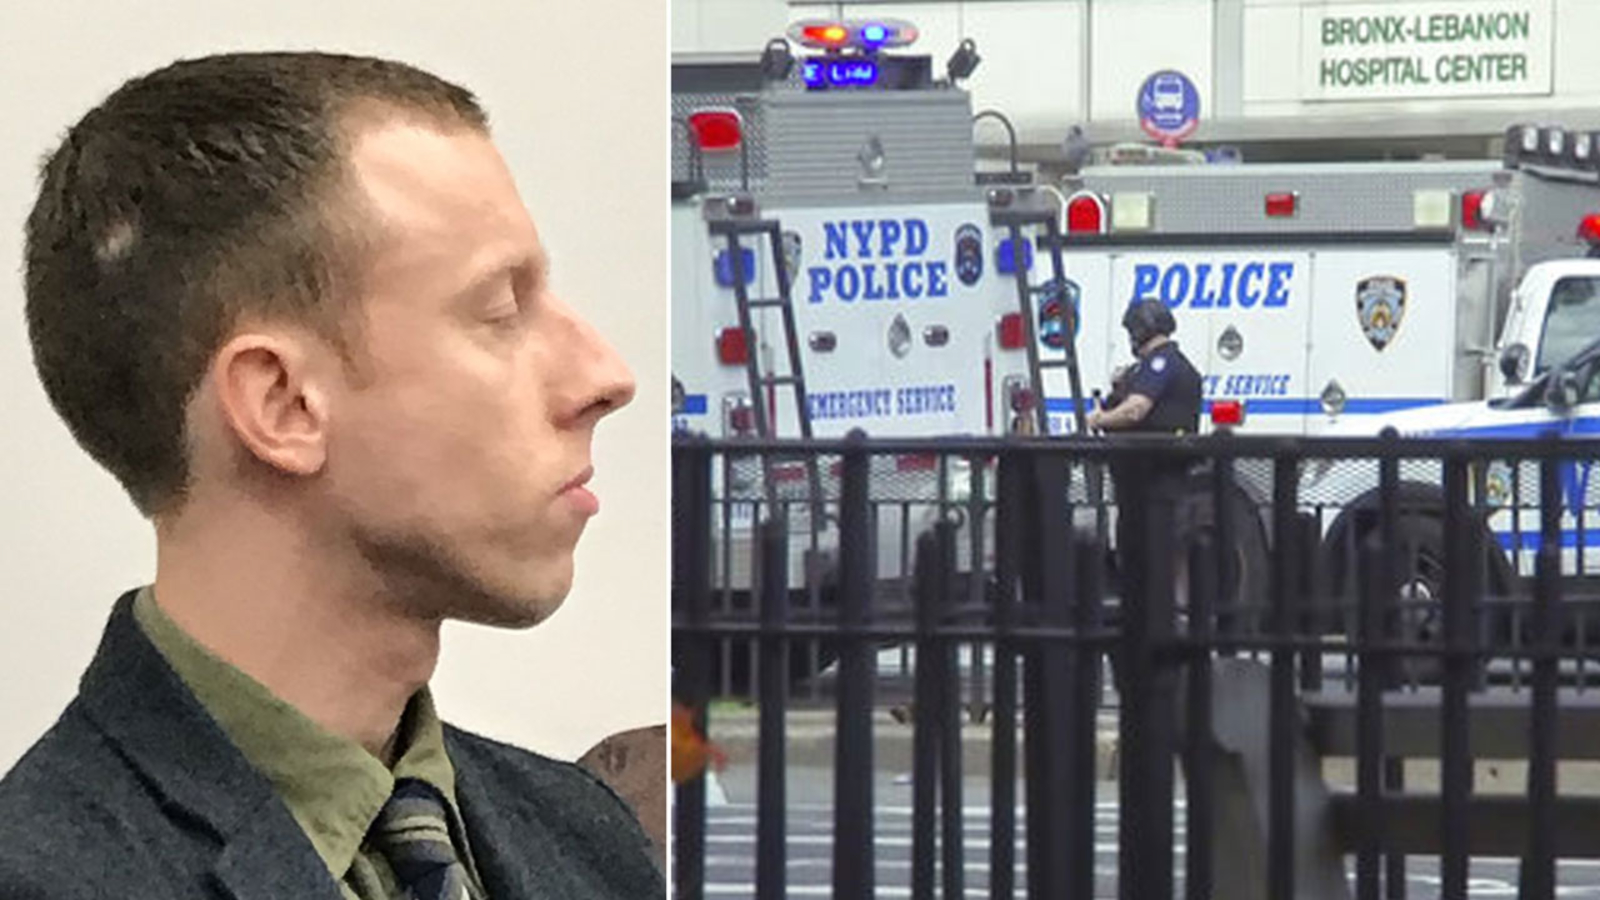 Medical Resident Sues Bronx Lebanon Hospital For 2017 Shooting Rampage Abc7 New York